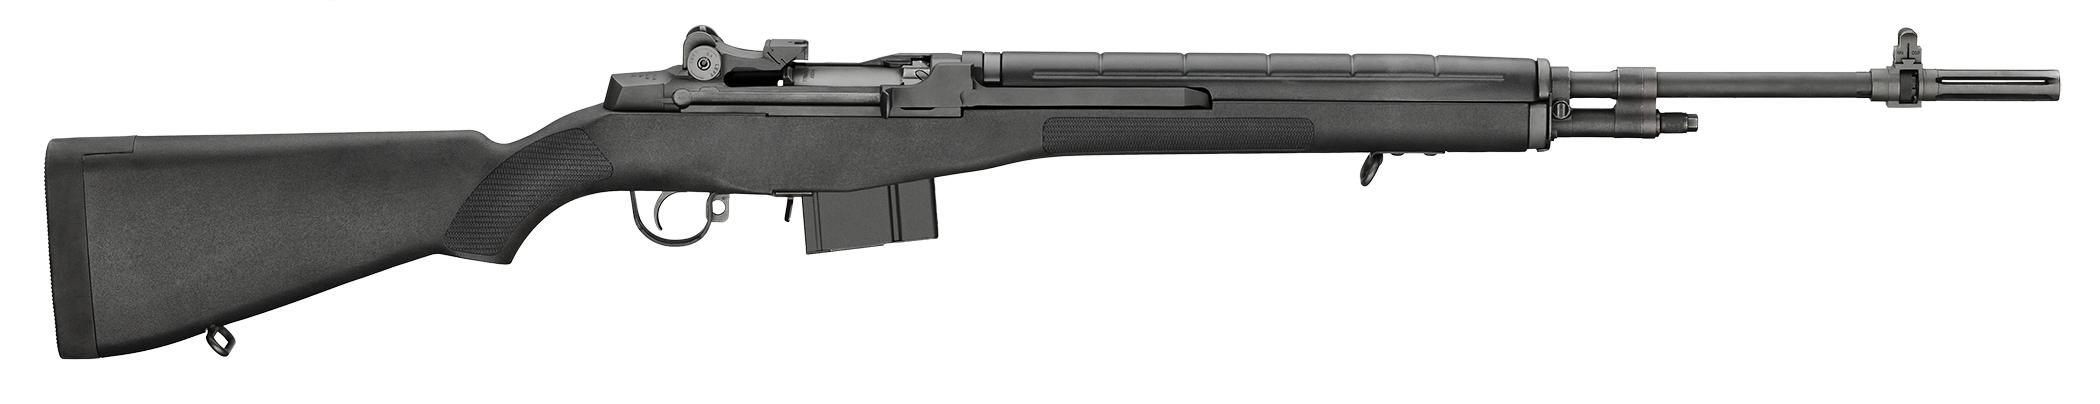 Springfield Armory M1A STANDARD 7.62 X 51MM   308 WIN